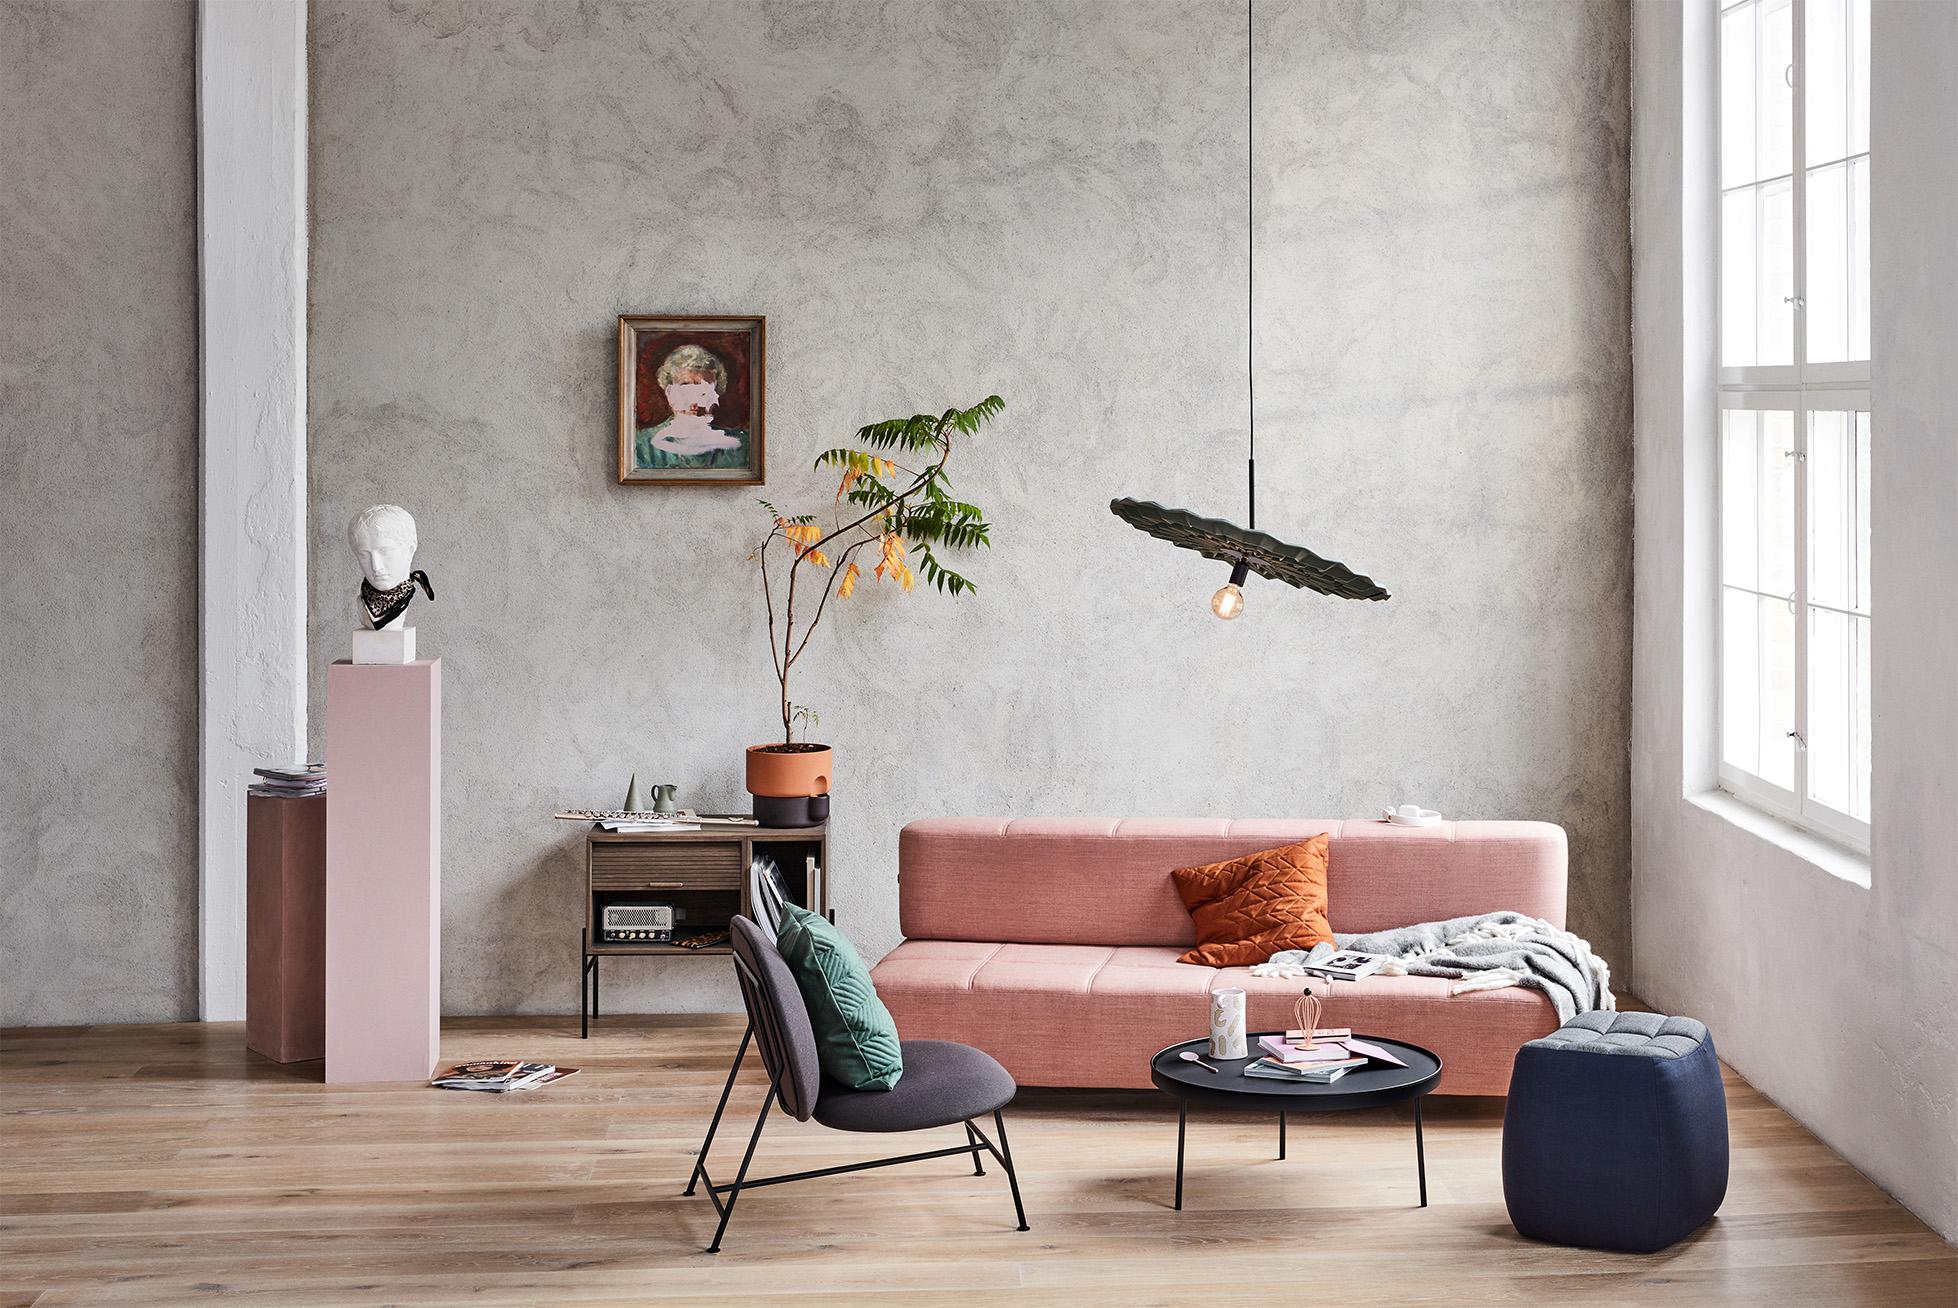 Livingroom_front_landscape - Northern_Photo_Chris_ Tonnesen - Low res